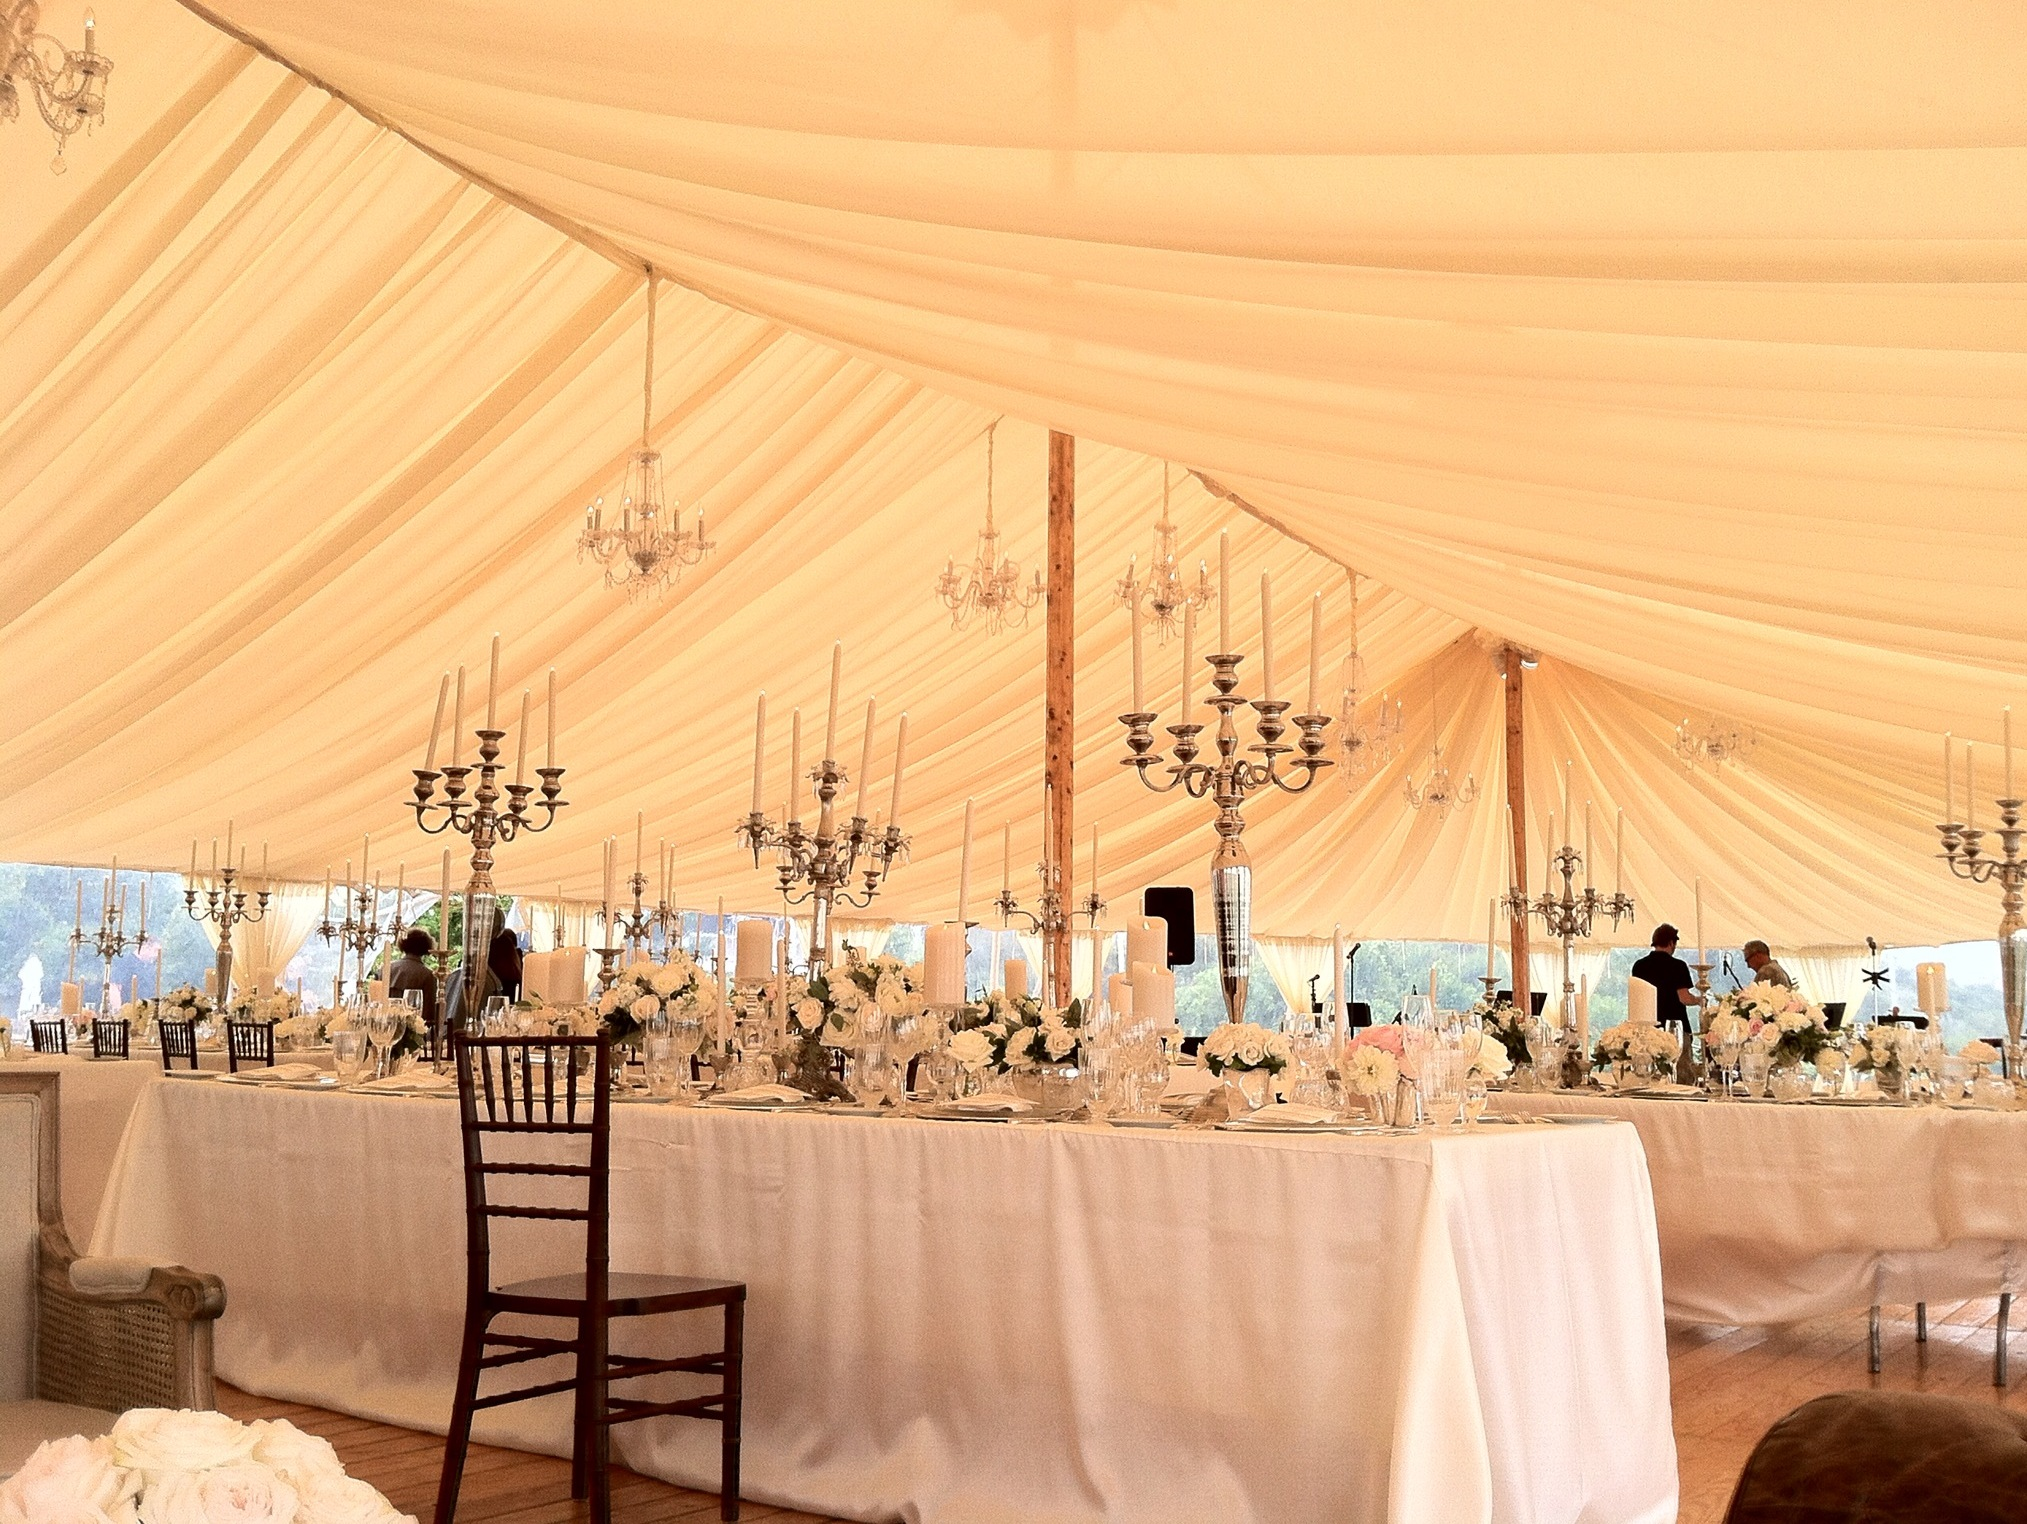 Nantucket-Tent-1.jpg